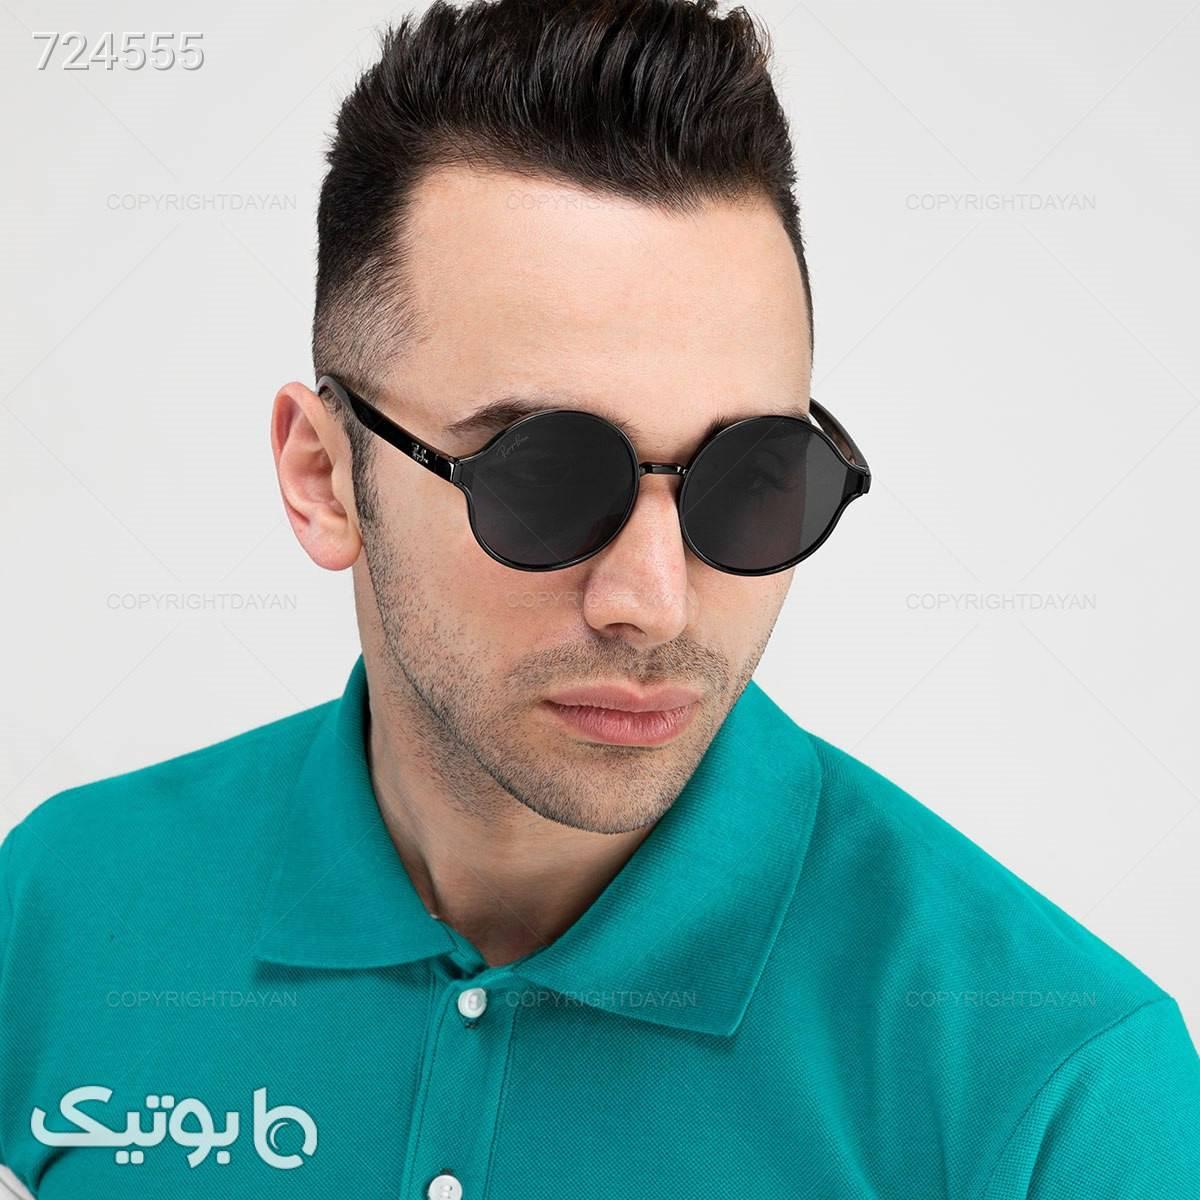 عینک آفتابی Ray Ban مدل 18419   مشکی عینک آفتابی